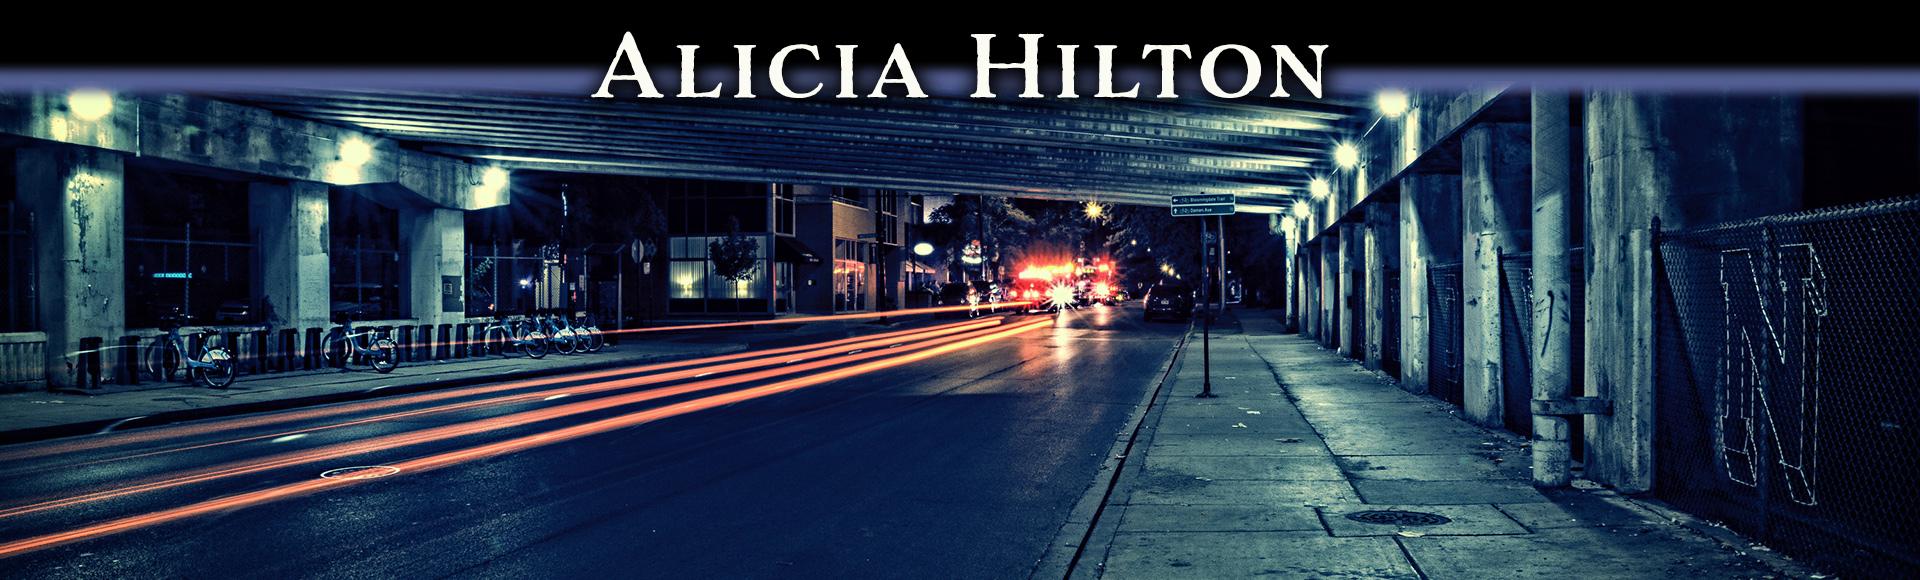 Author Alicia Hilton